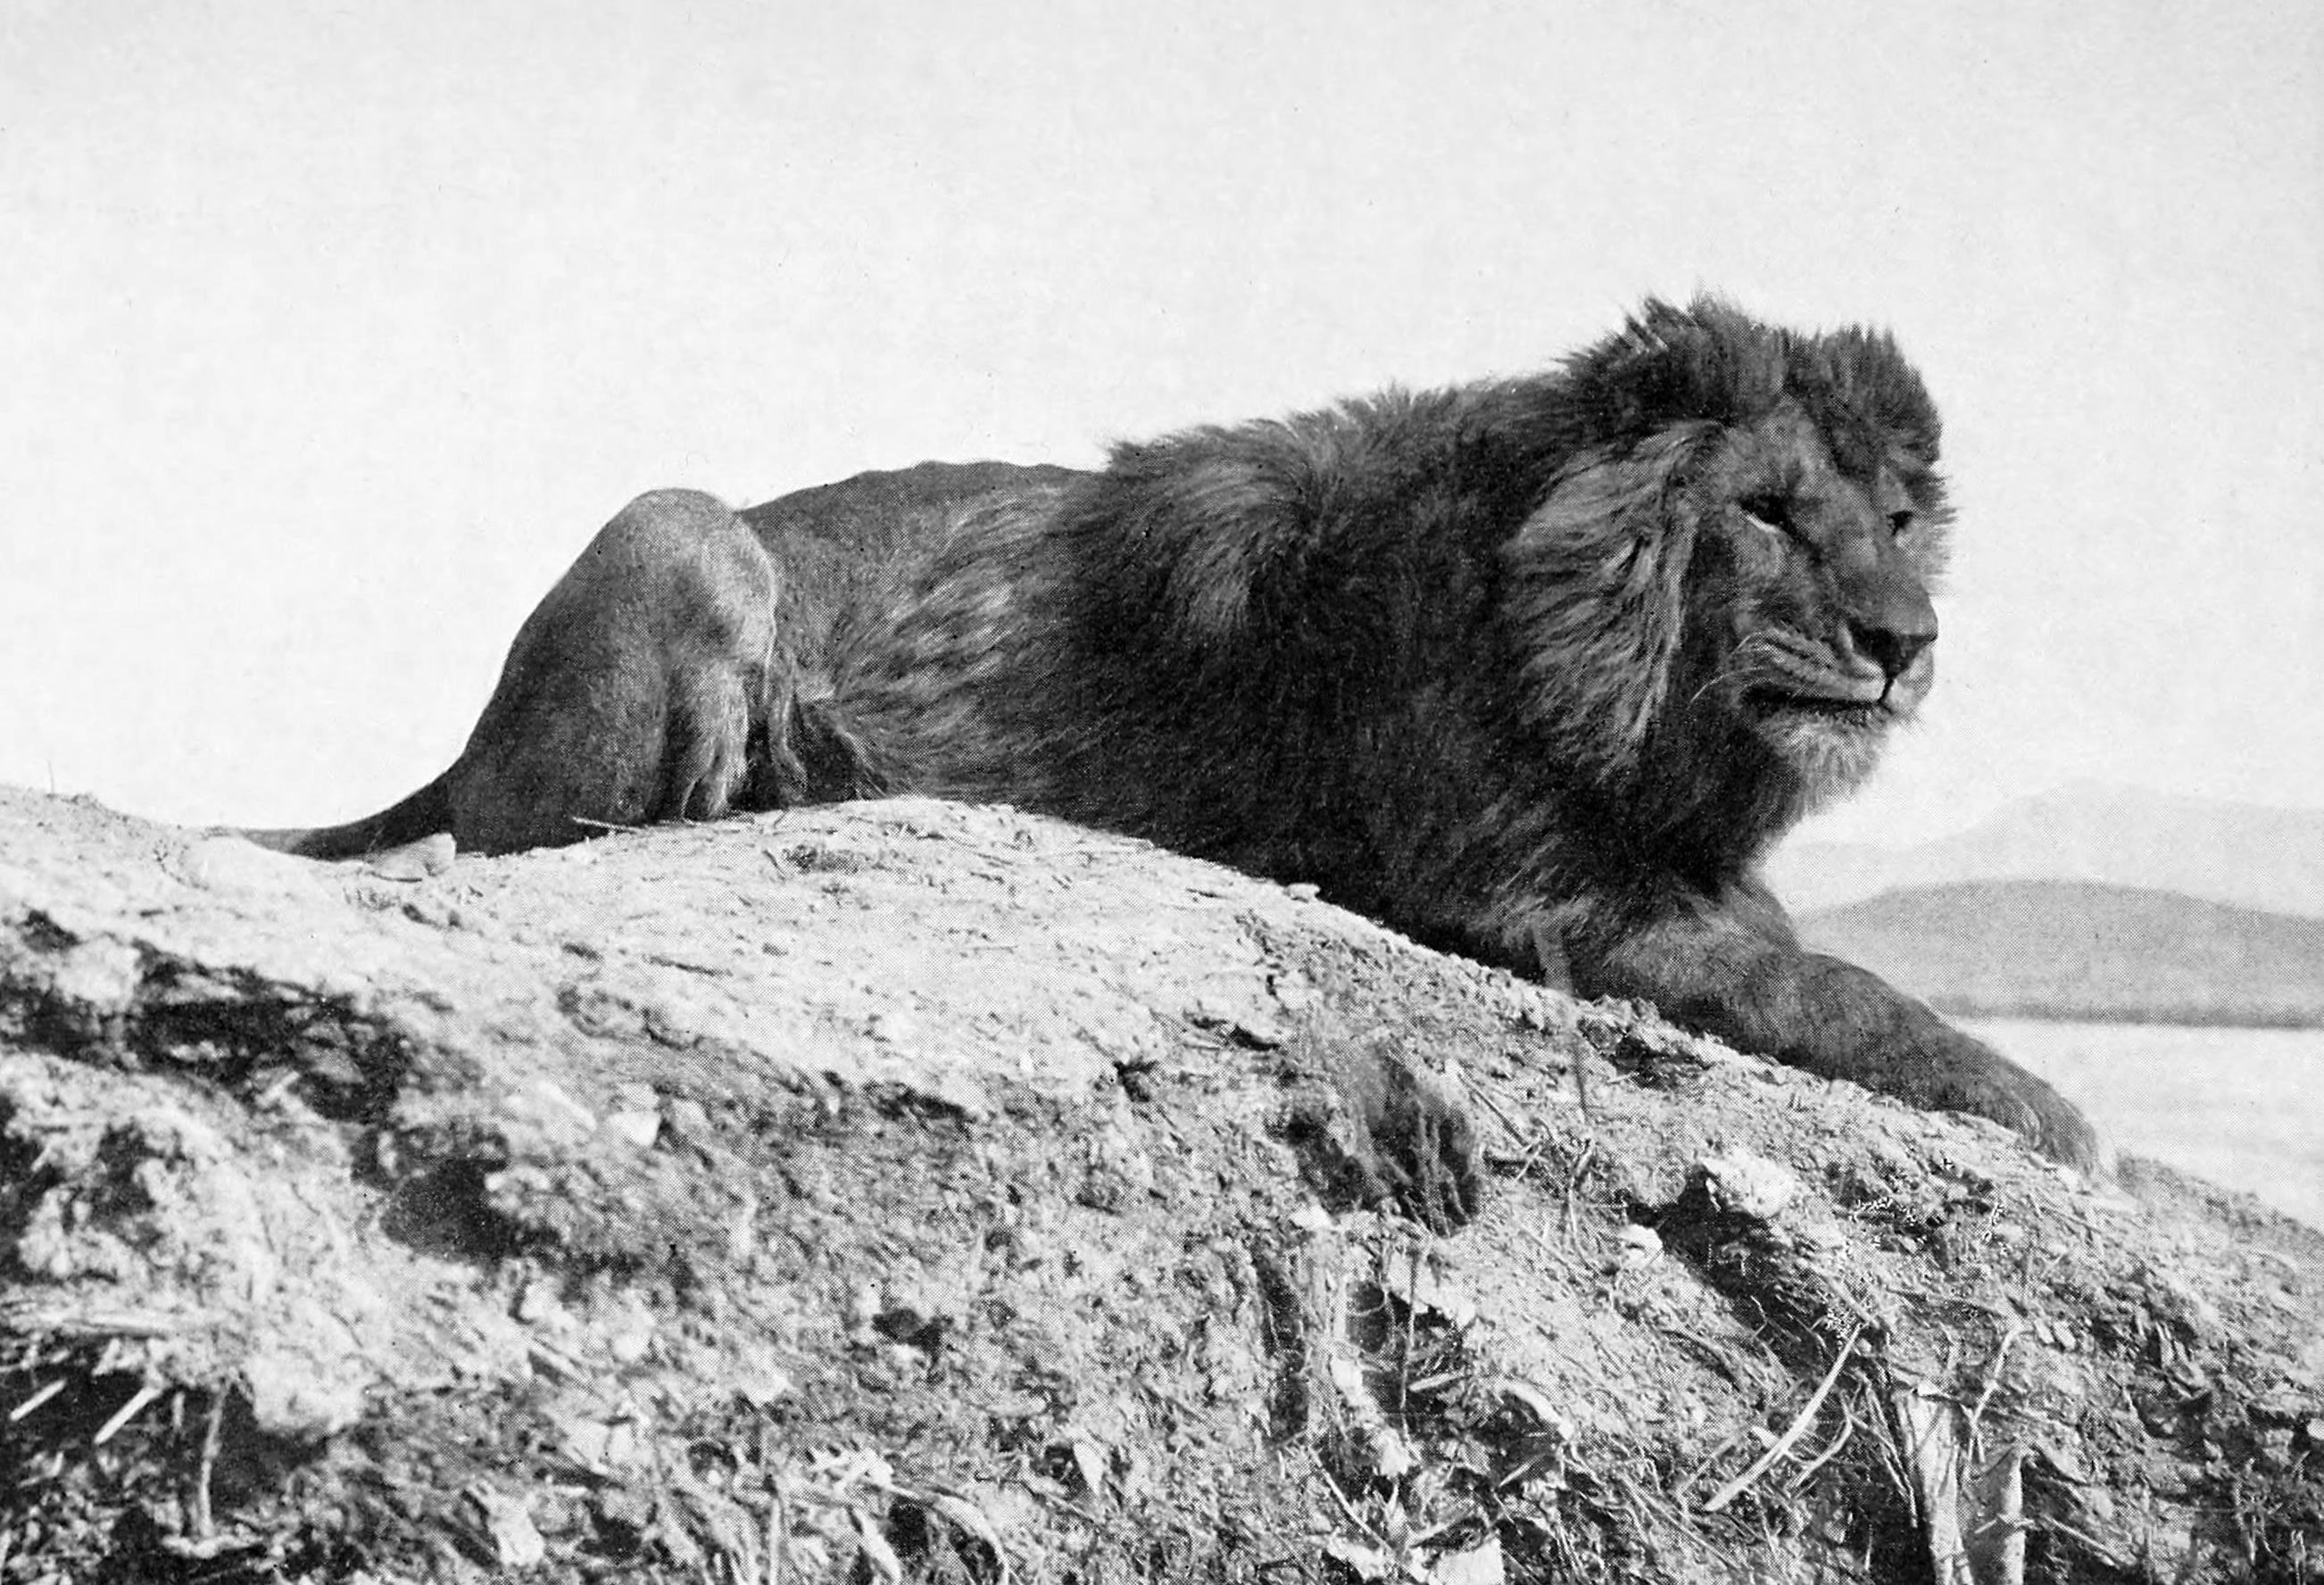 http://upload.wikimedia.org/wikipedia/commons/4/43/Barbary_lion.jpg